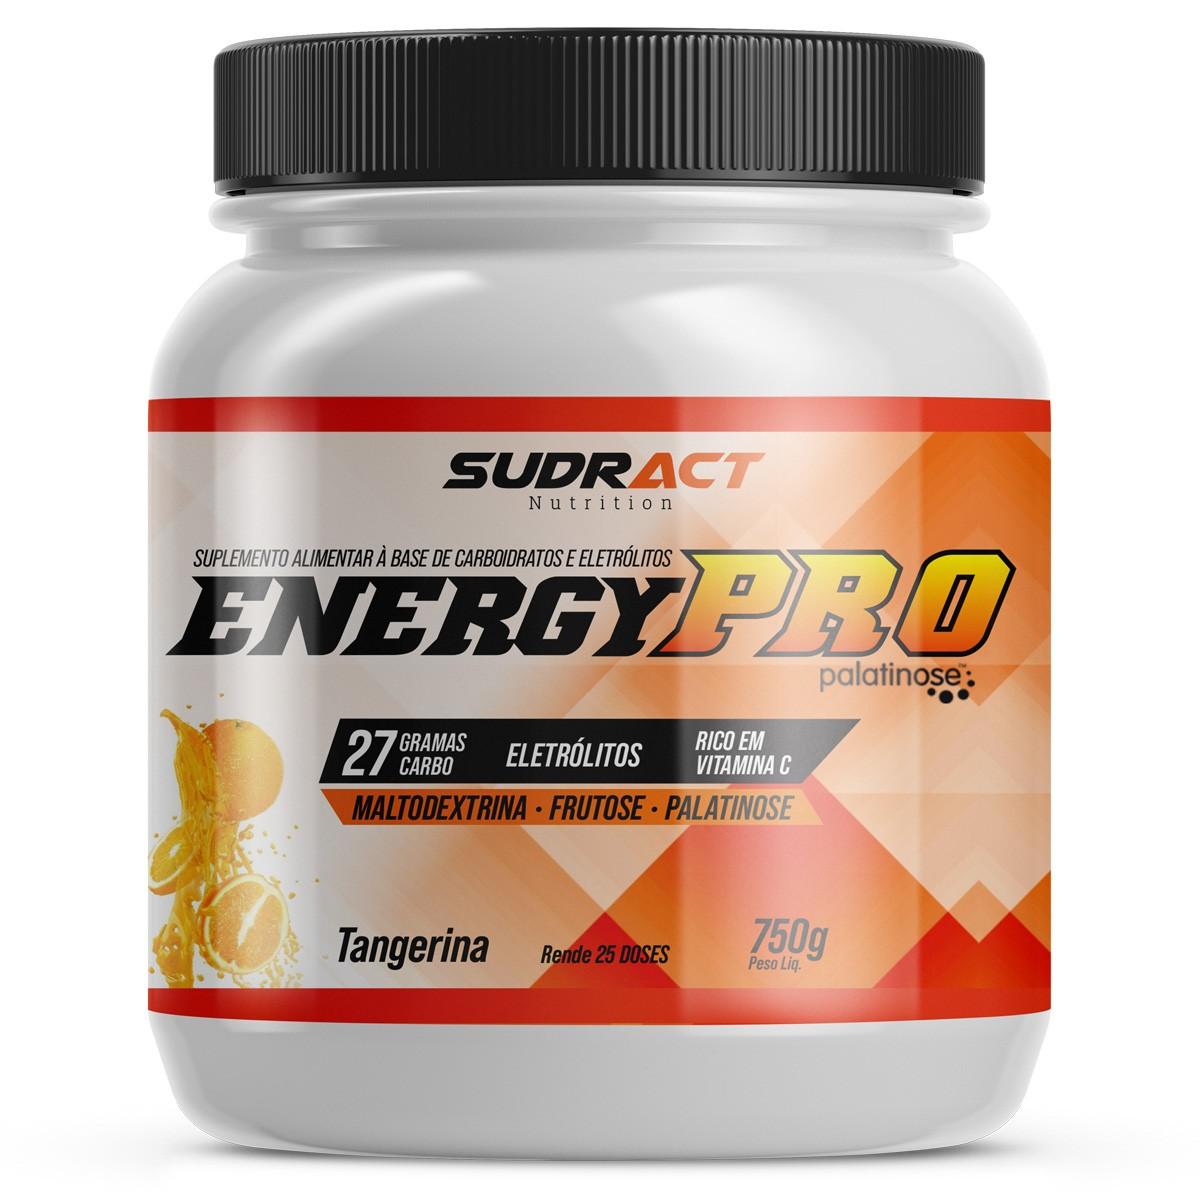 Energy Pro 750g - Sudract Nutrition